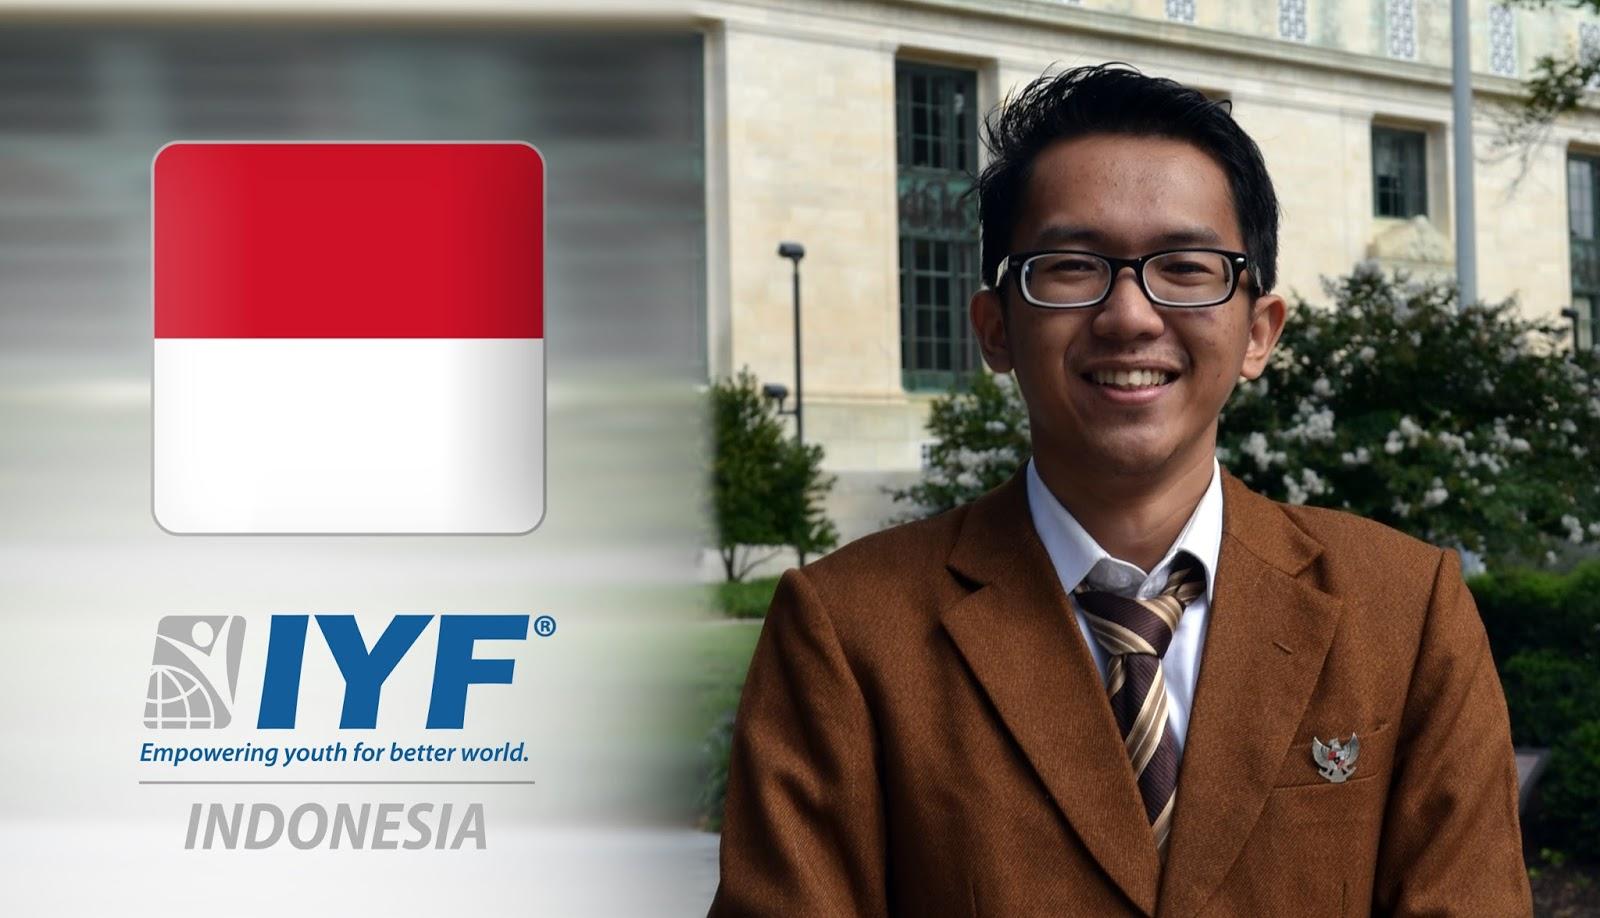 Panji Aziz Pratama, IYF Representative in Indonesia